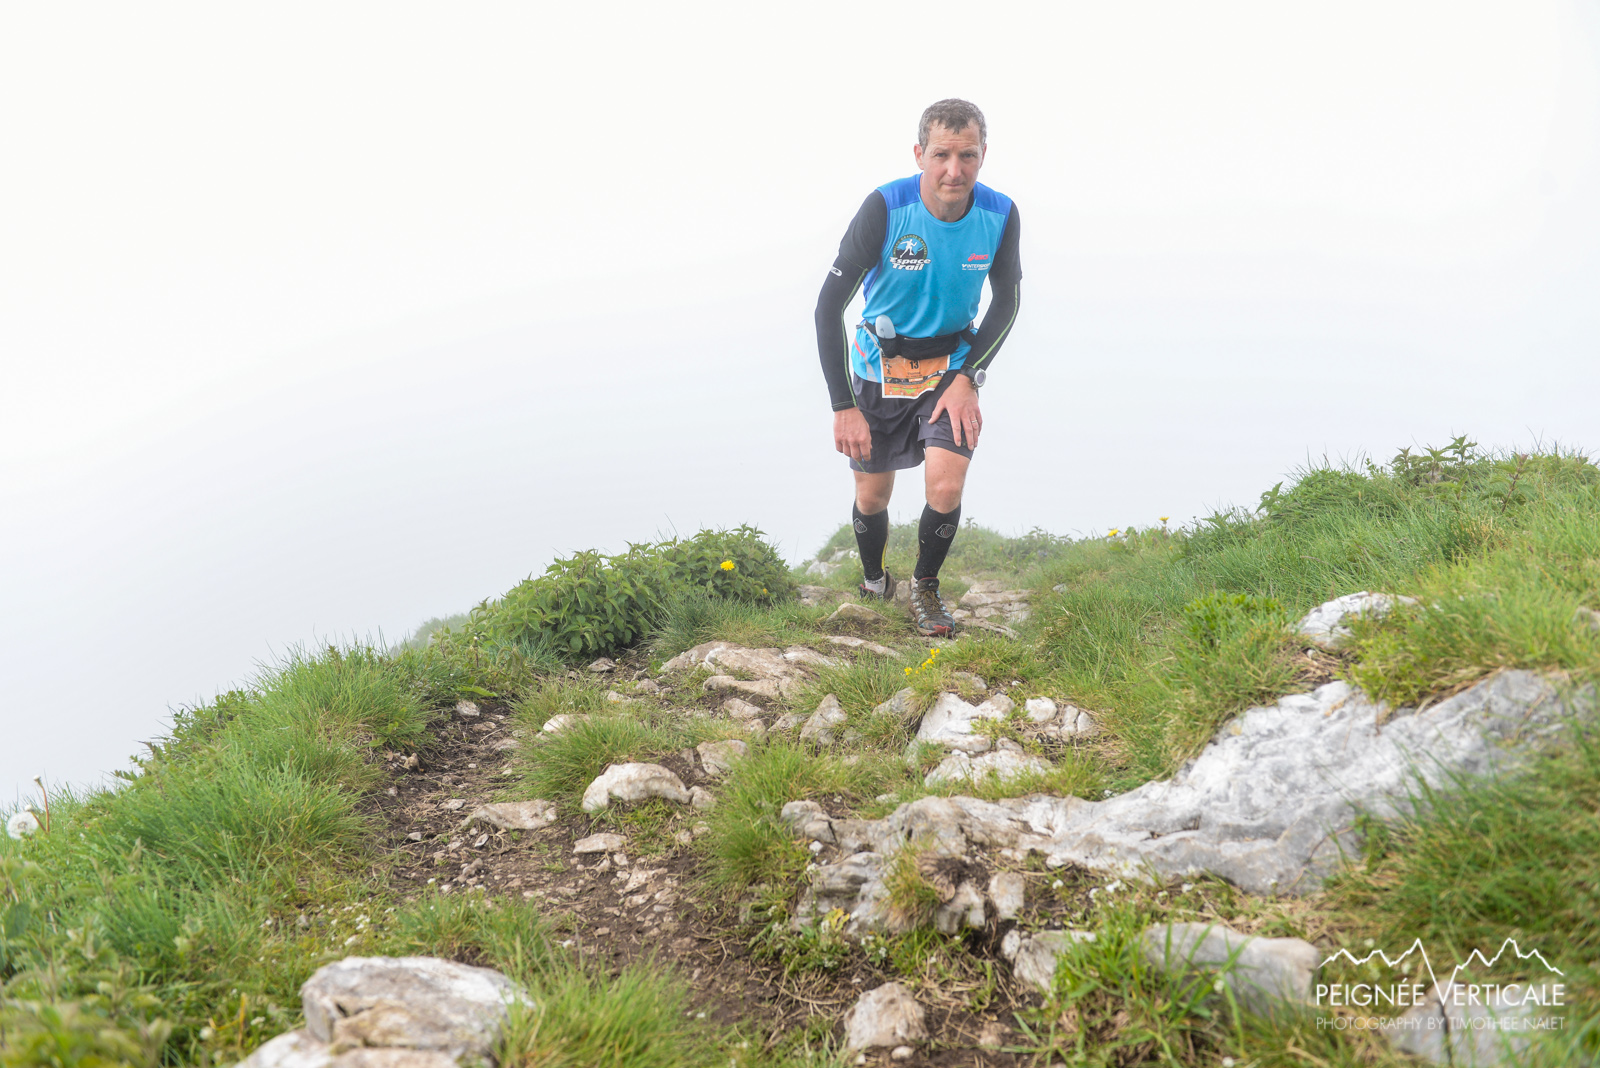 MaxiRace-Annecy-2014-Team-Hoka-Timothee-Nalet-1009.jpg